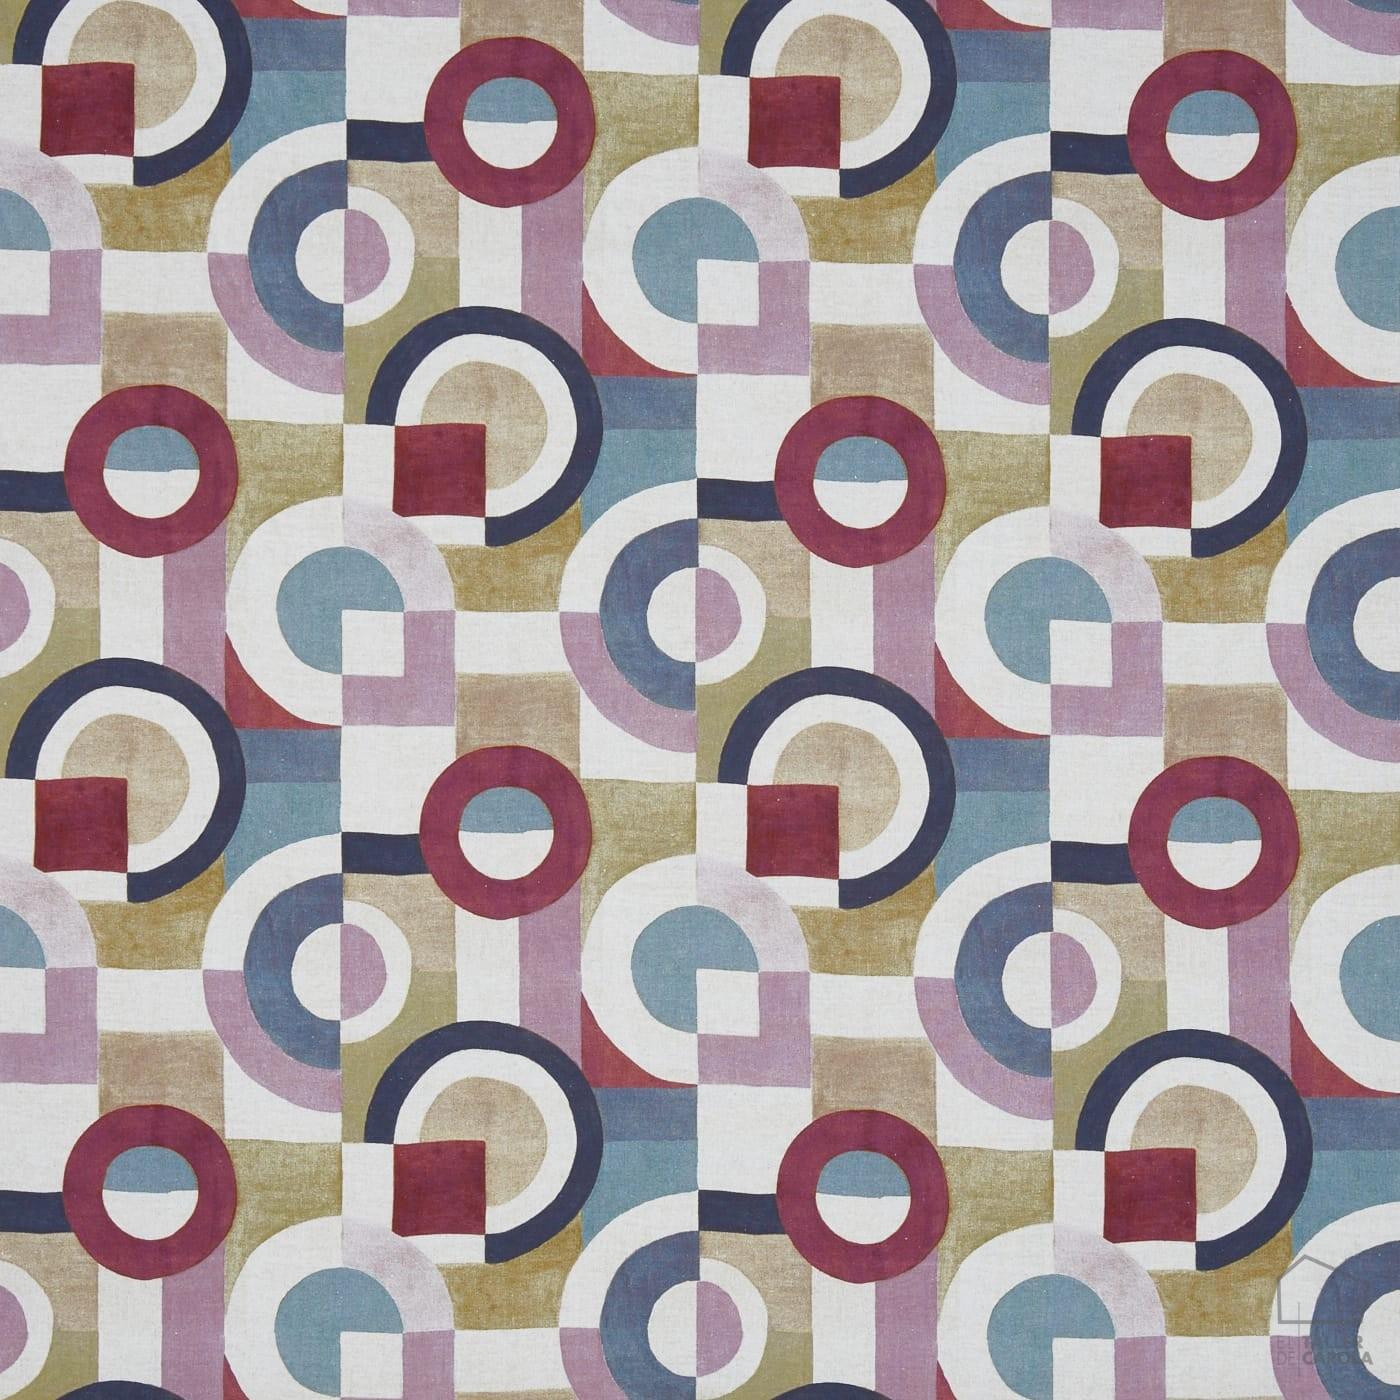 069kan-upw-che-tela-geometrica-circulos-magenta